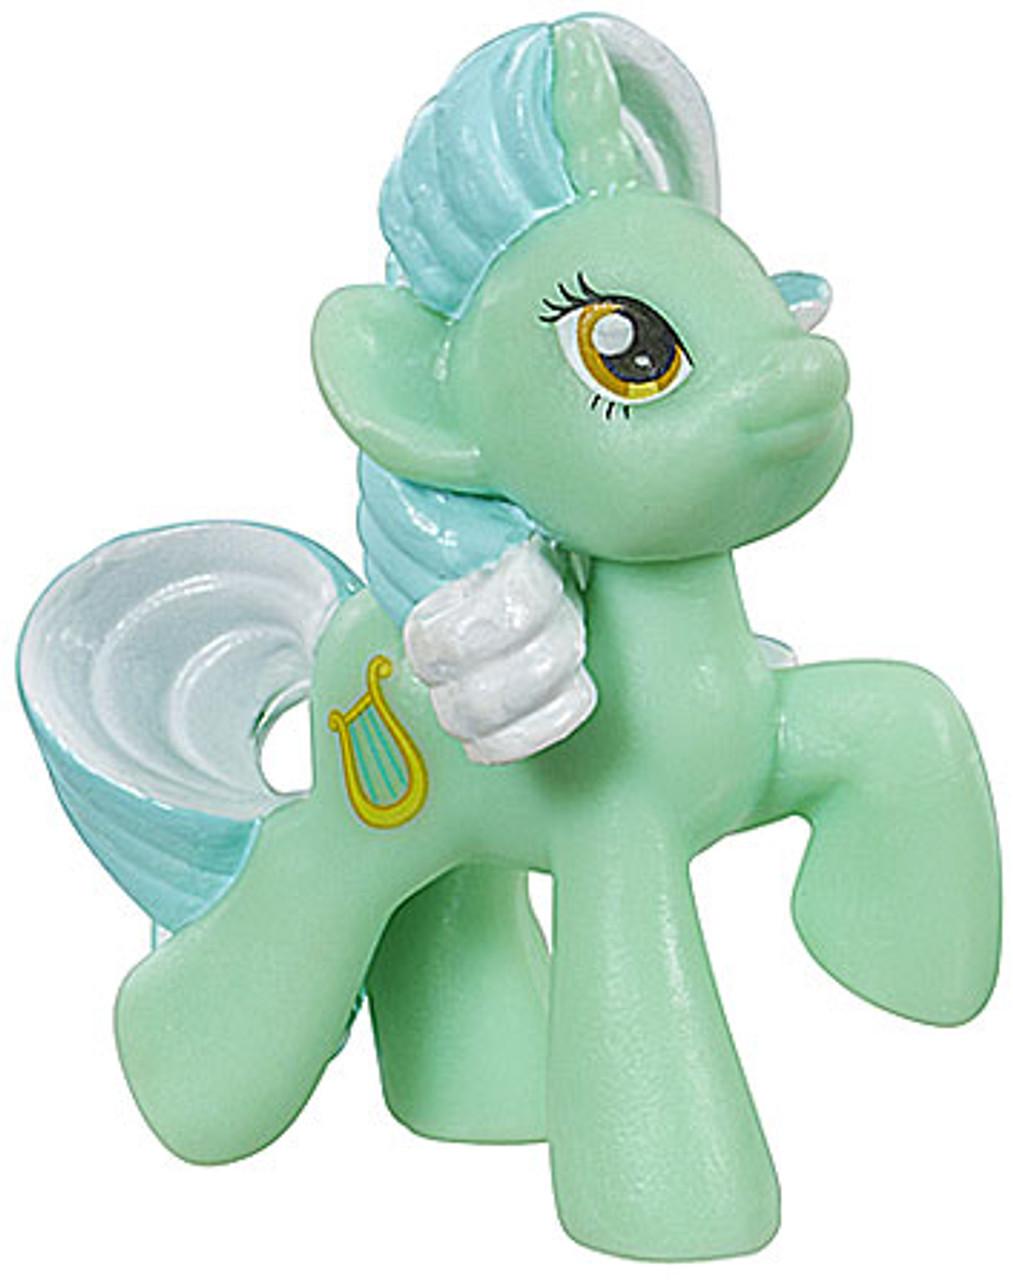 My Little Pony Friendship is Magic 2 Inch Lyra Heartstrings PVC Figure